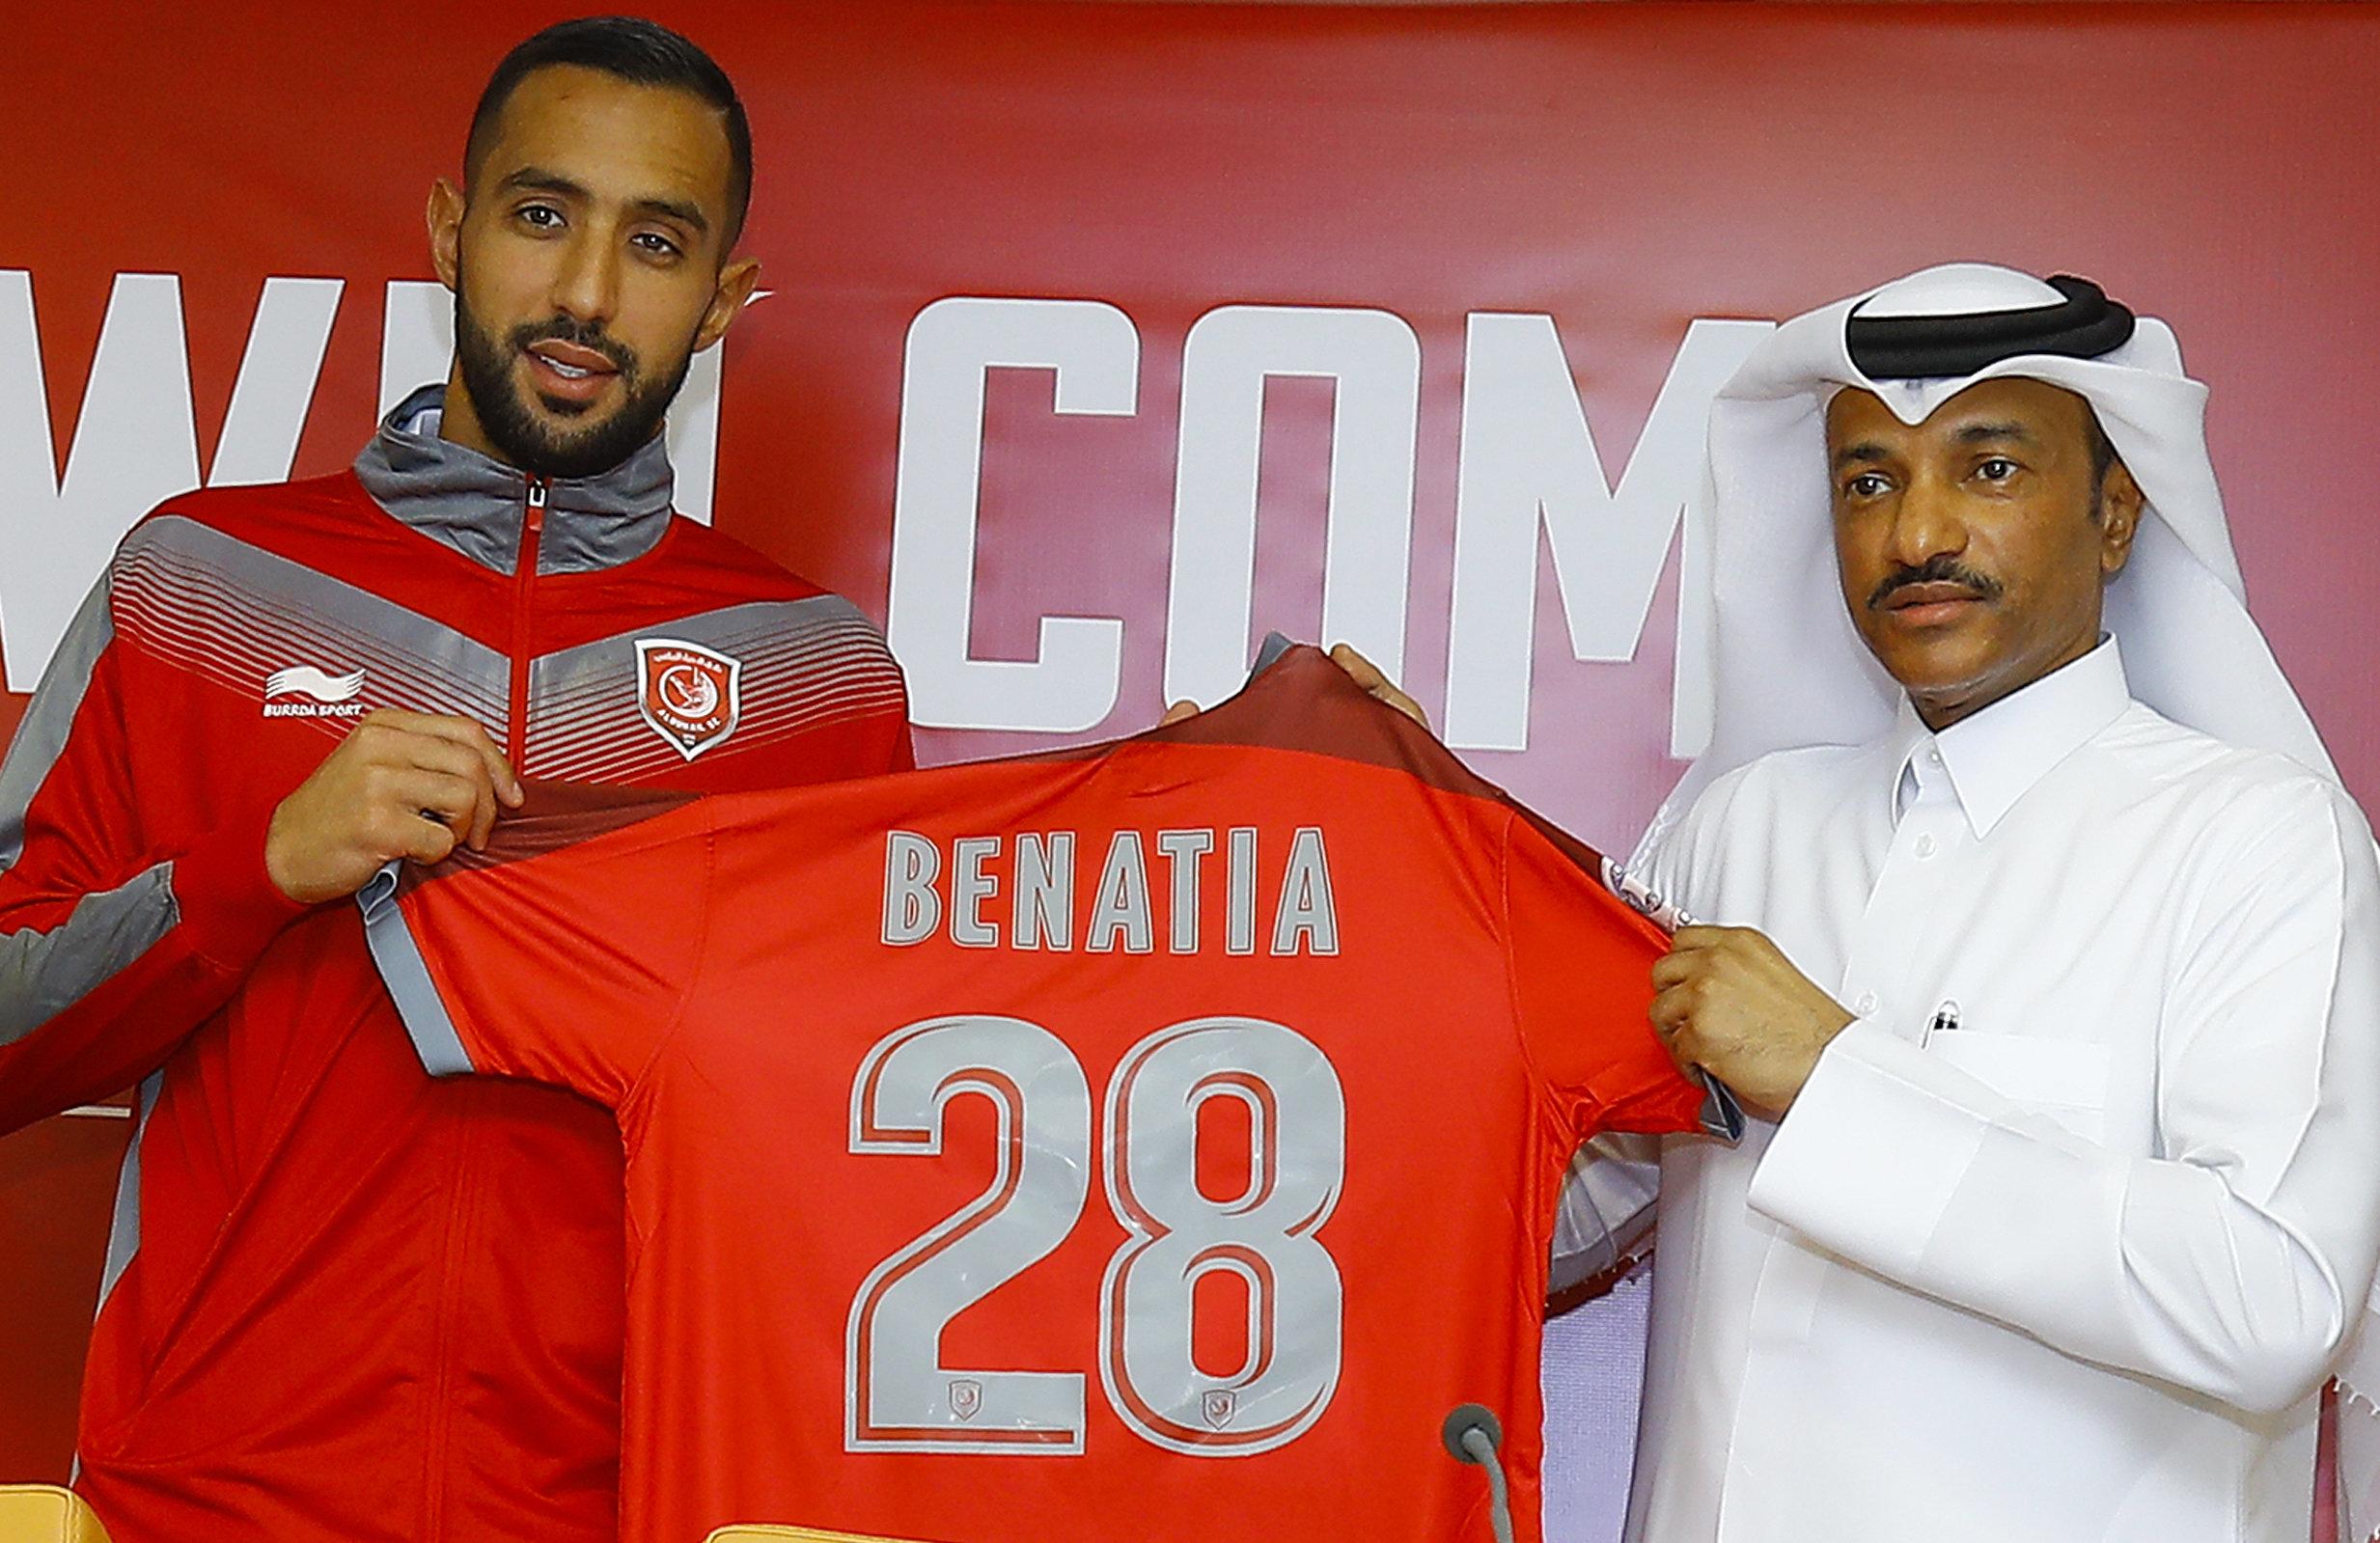 Medhi Benatia au Qatar: